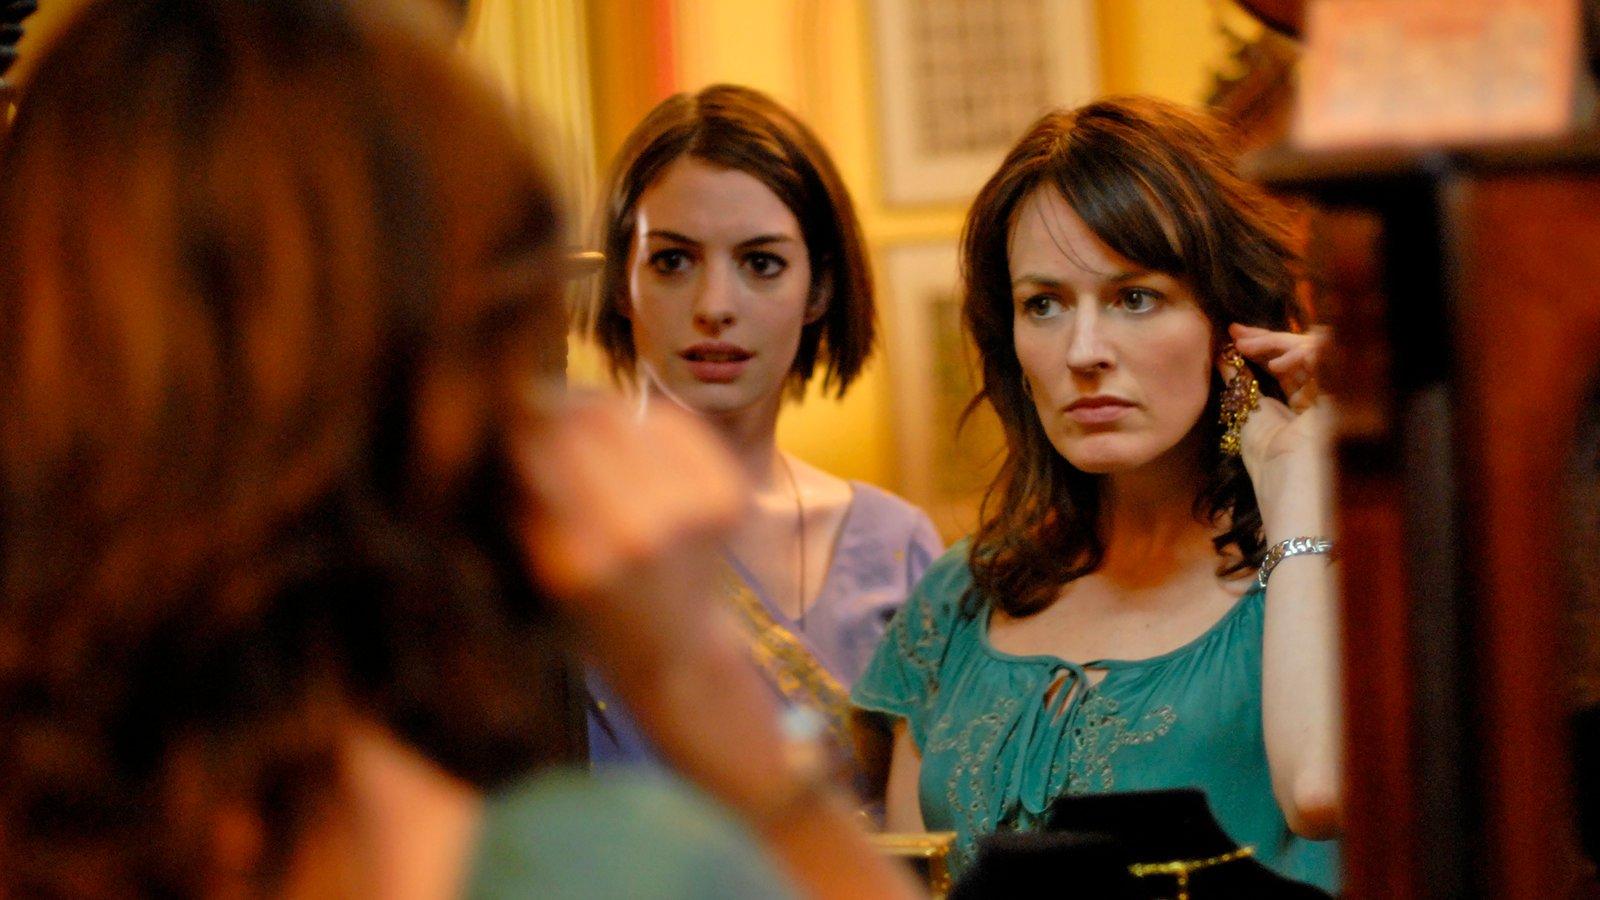 Oscar 2009 Nomination Predictions: Supporting Actress